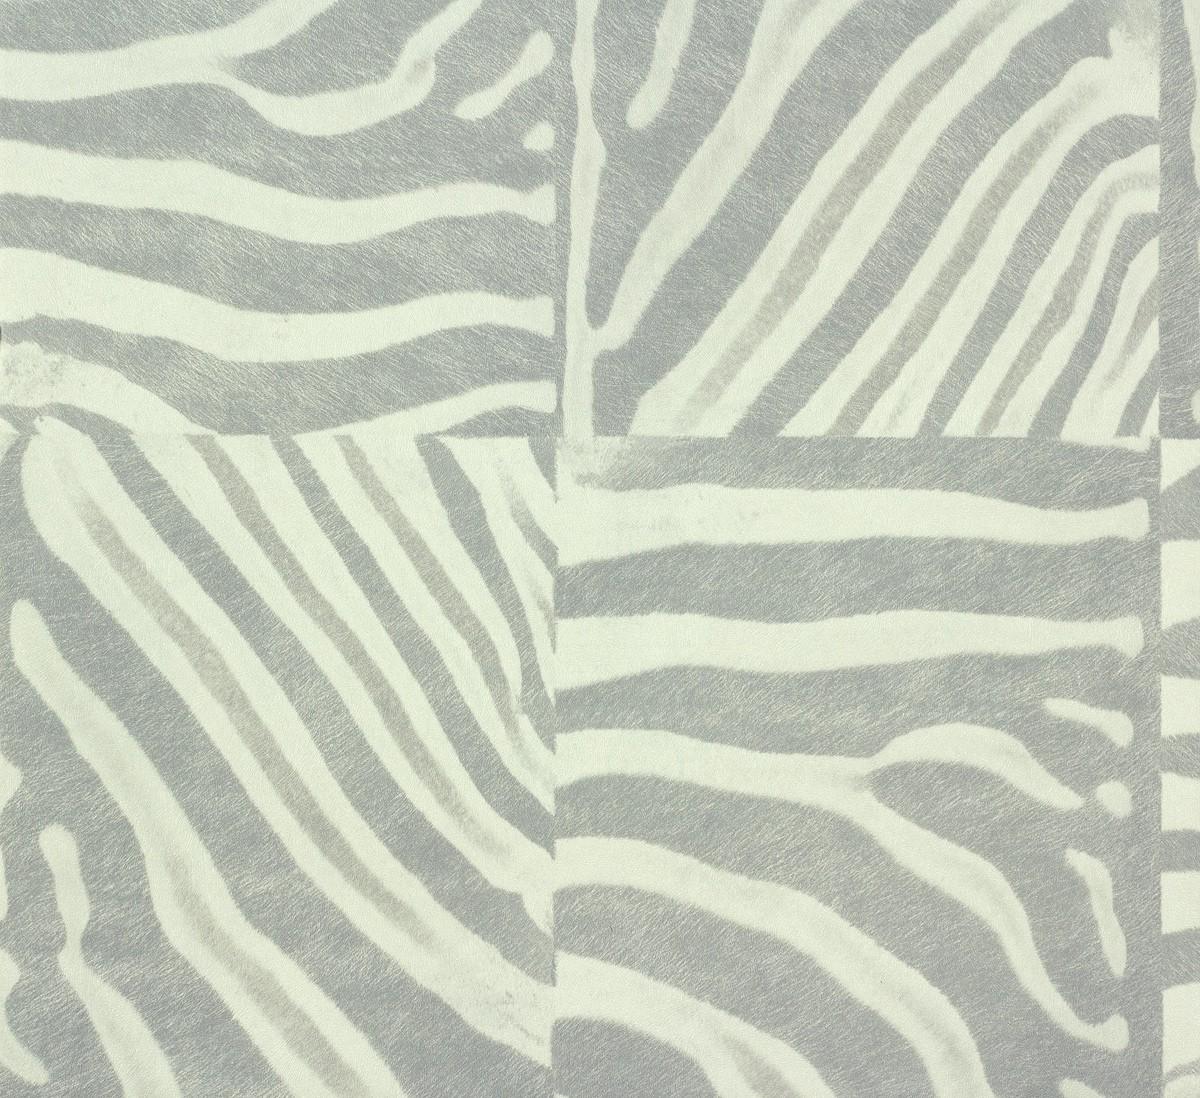 rasch tapeten pop skin zebraoptik grau weiss 498530. Black Bedroom Furniture Sets. Home Design Ideas